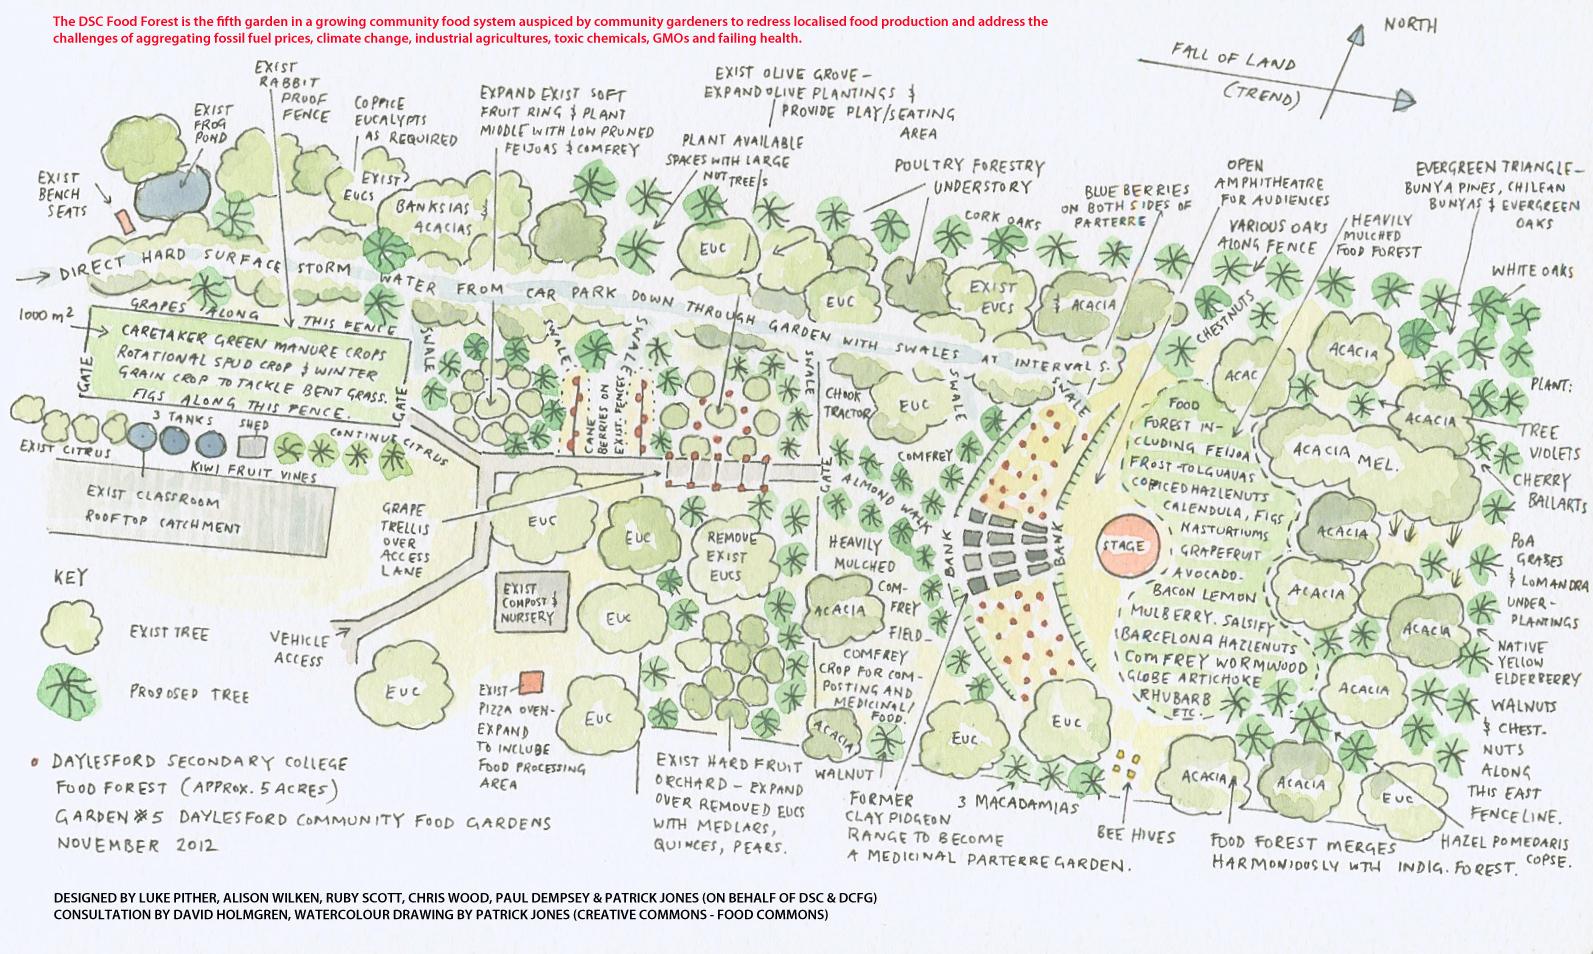 School garden design drawing - Drawing By Patrick Jones Click For Bigger